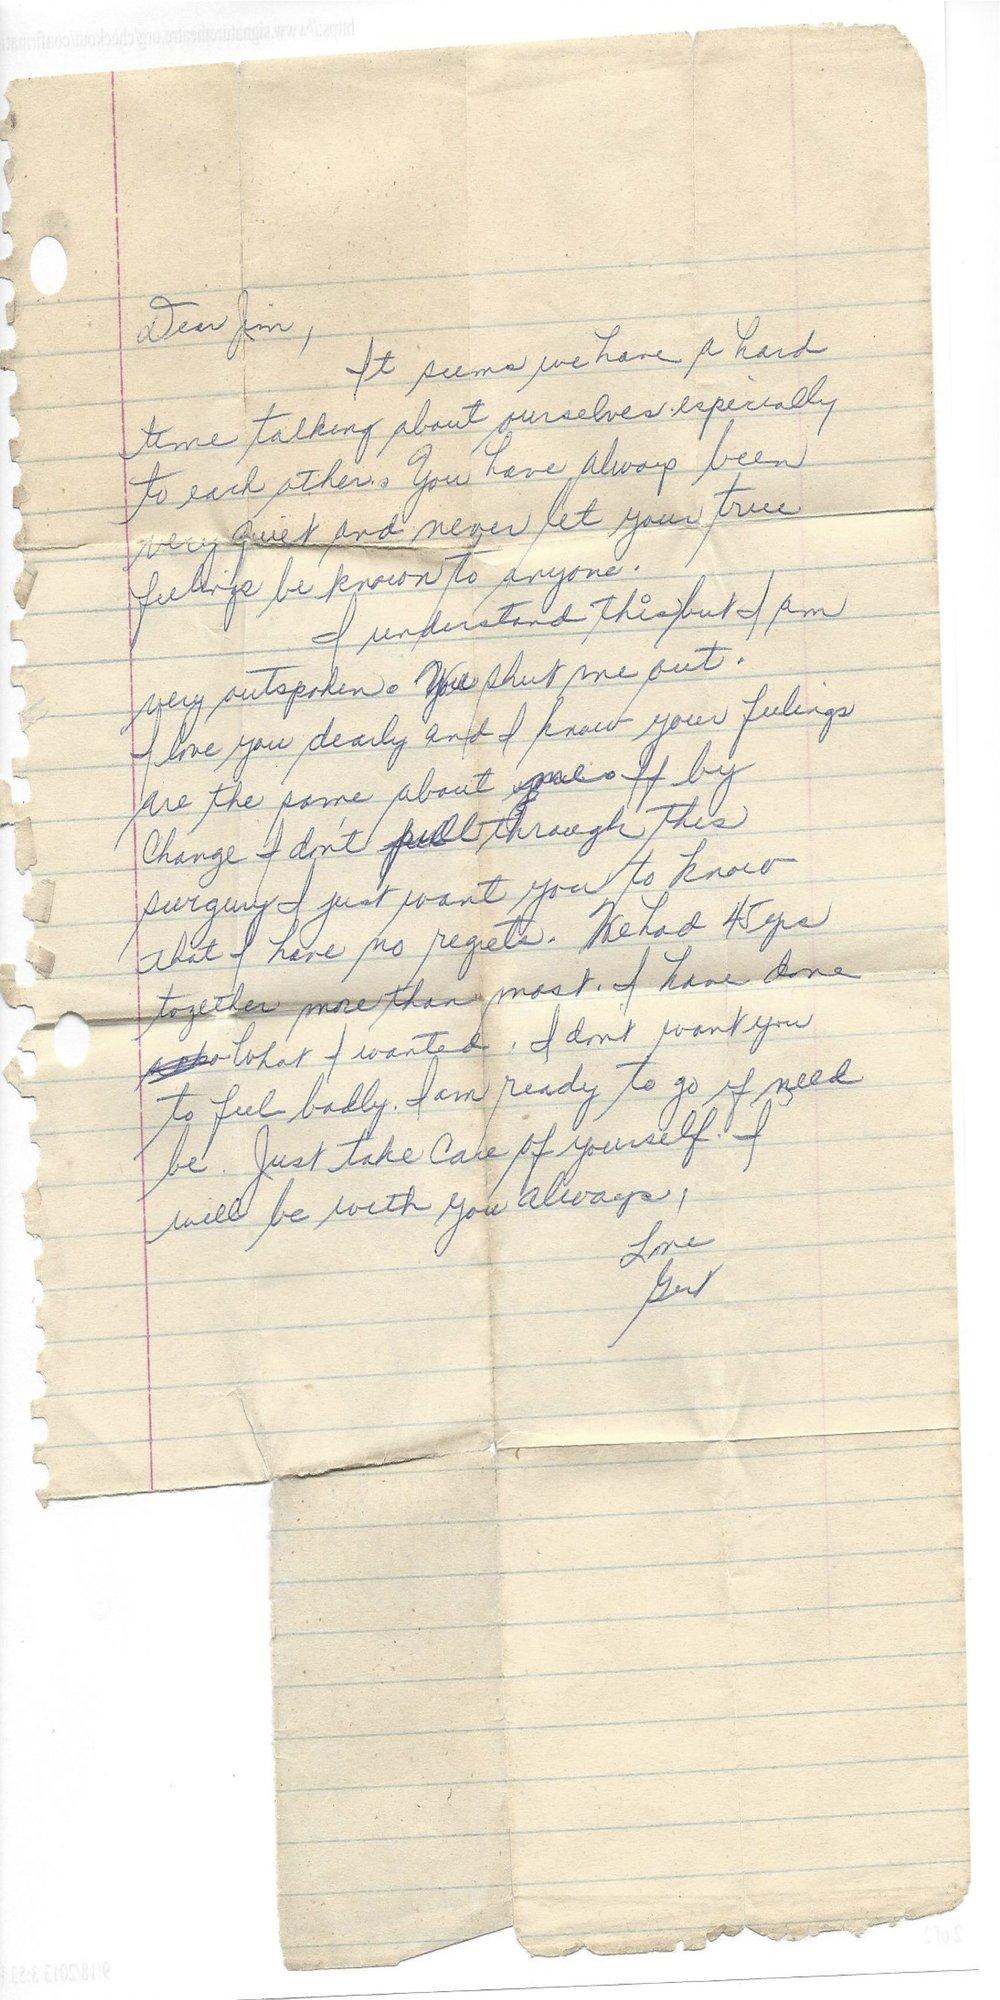 Archived Memories: Dear Jim